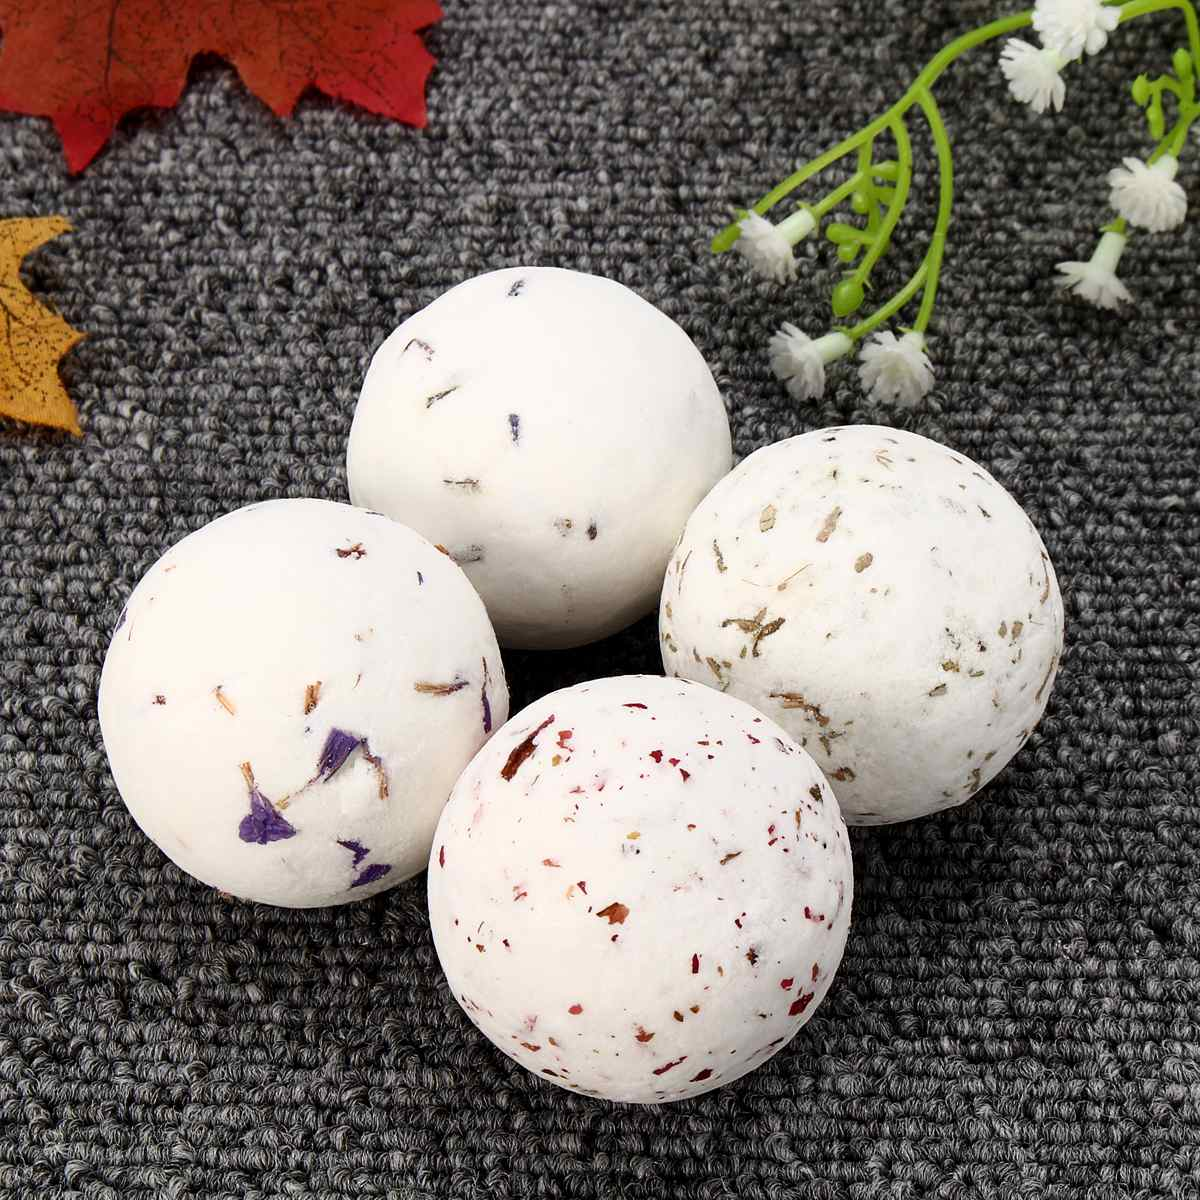 4pcs Whitening Moisture Essential Oil Body Scrubrose Oil Bath Ball Bomb For Home Bathroom Spa Bath Salt Bombs Balls